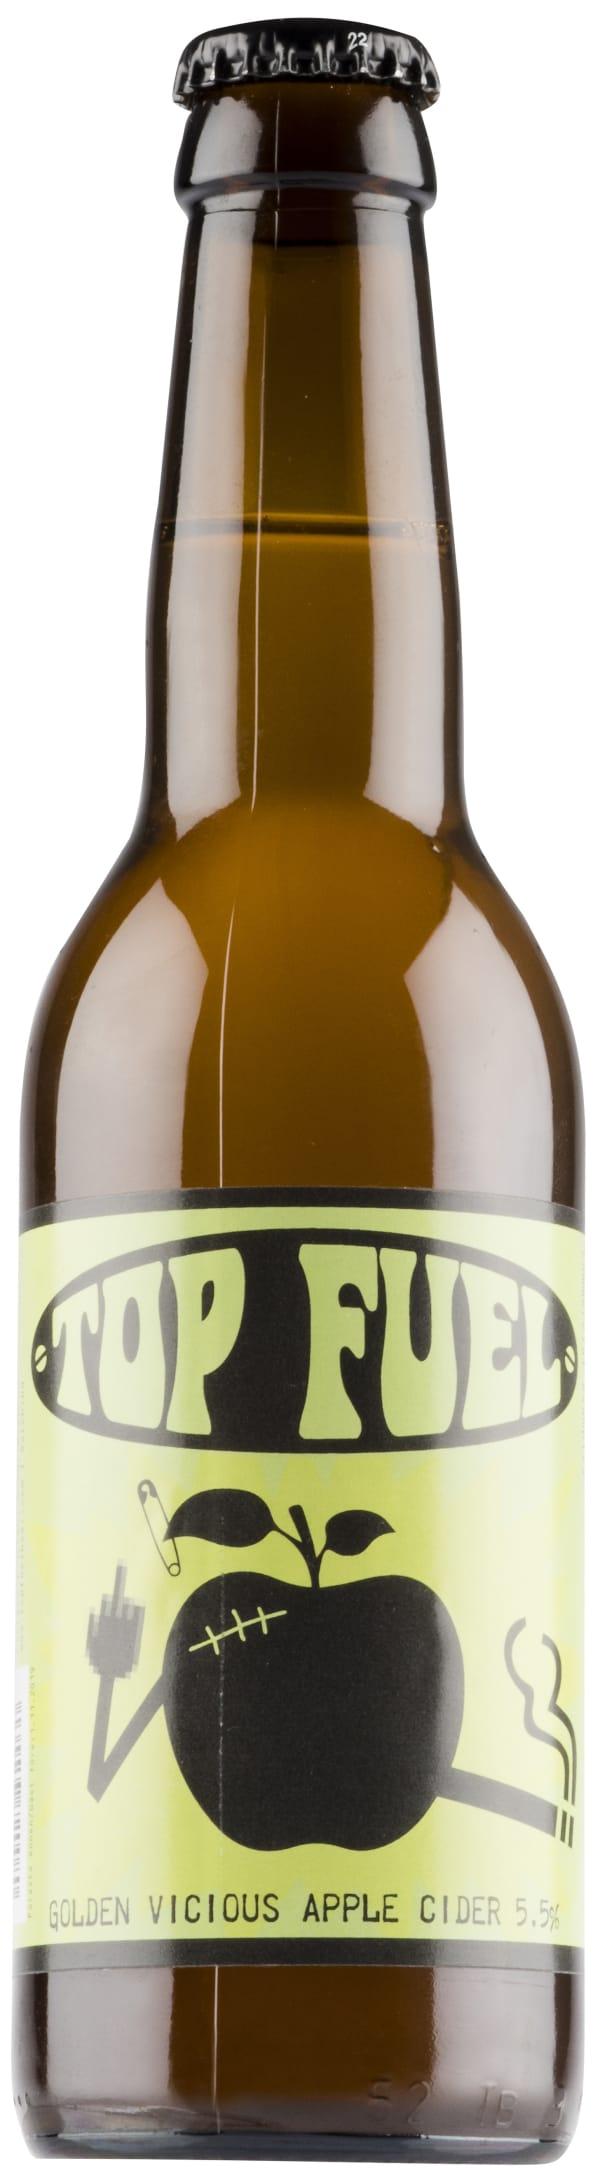 Top Fuel Golden Vicious Apple Cider